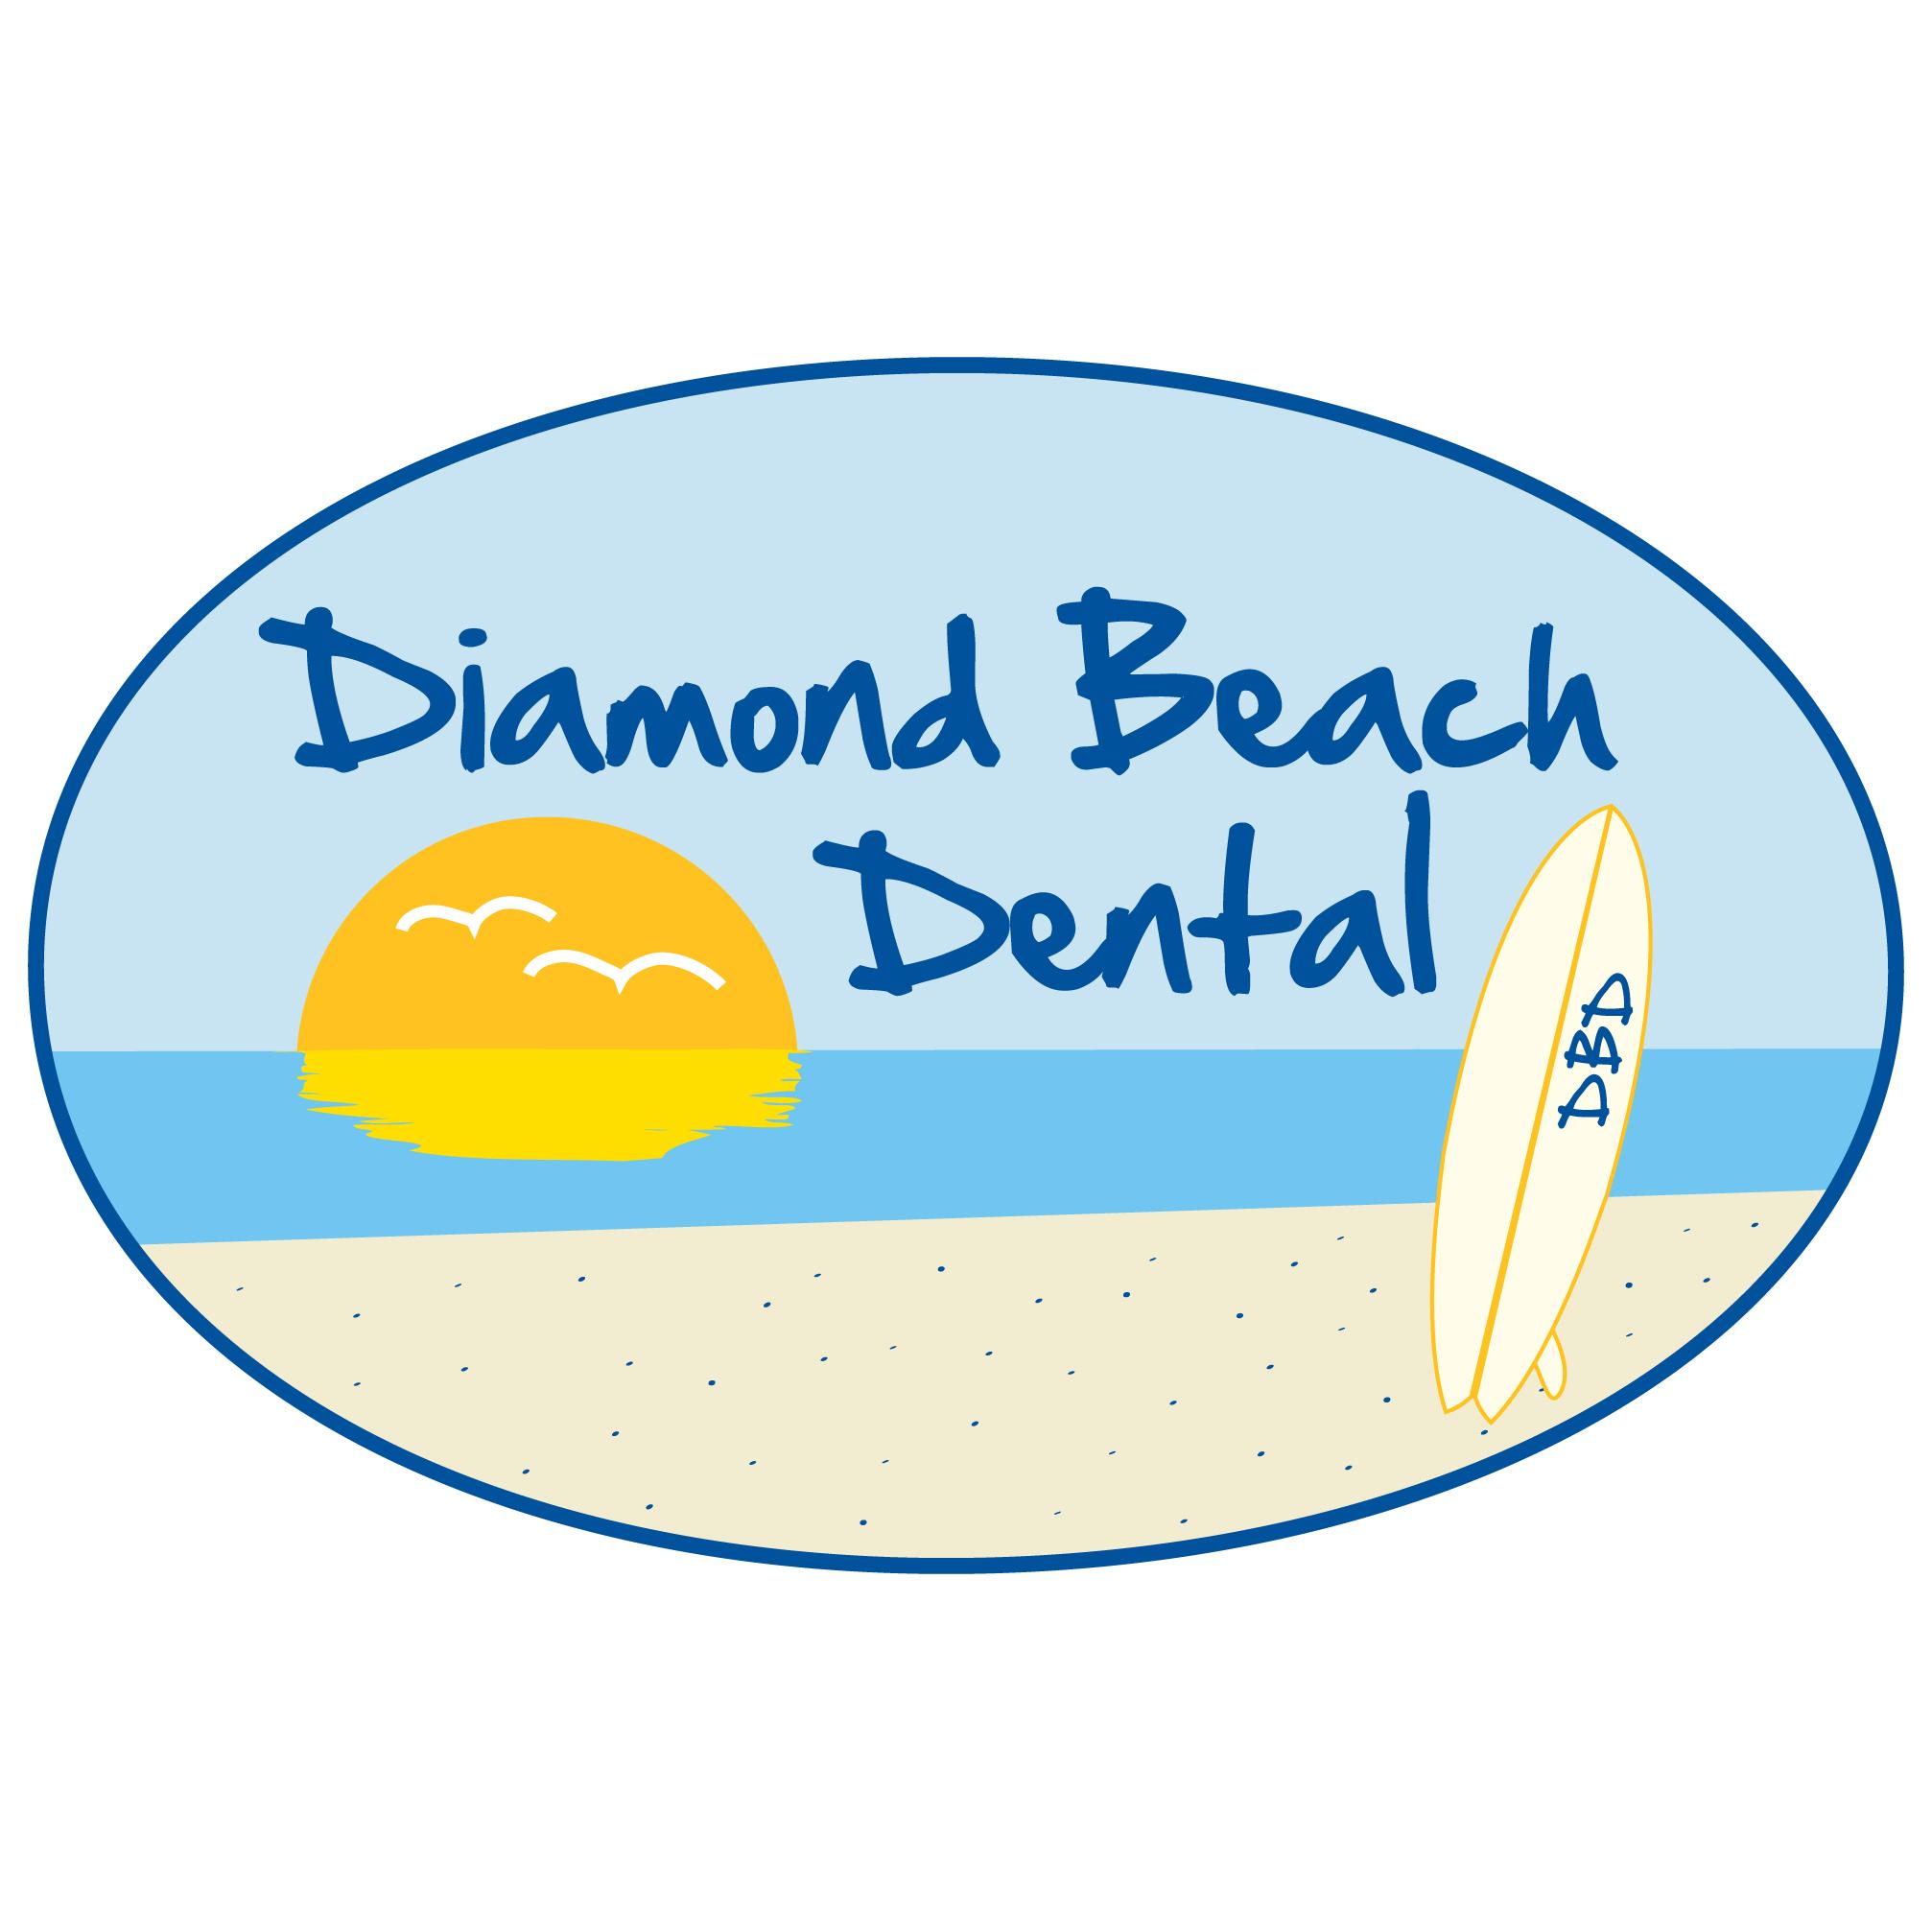 Diamond Beach Dental